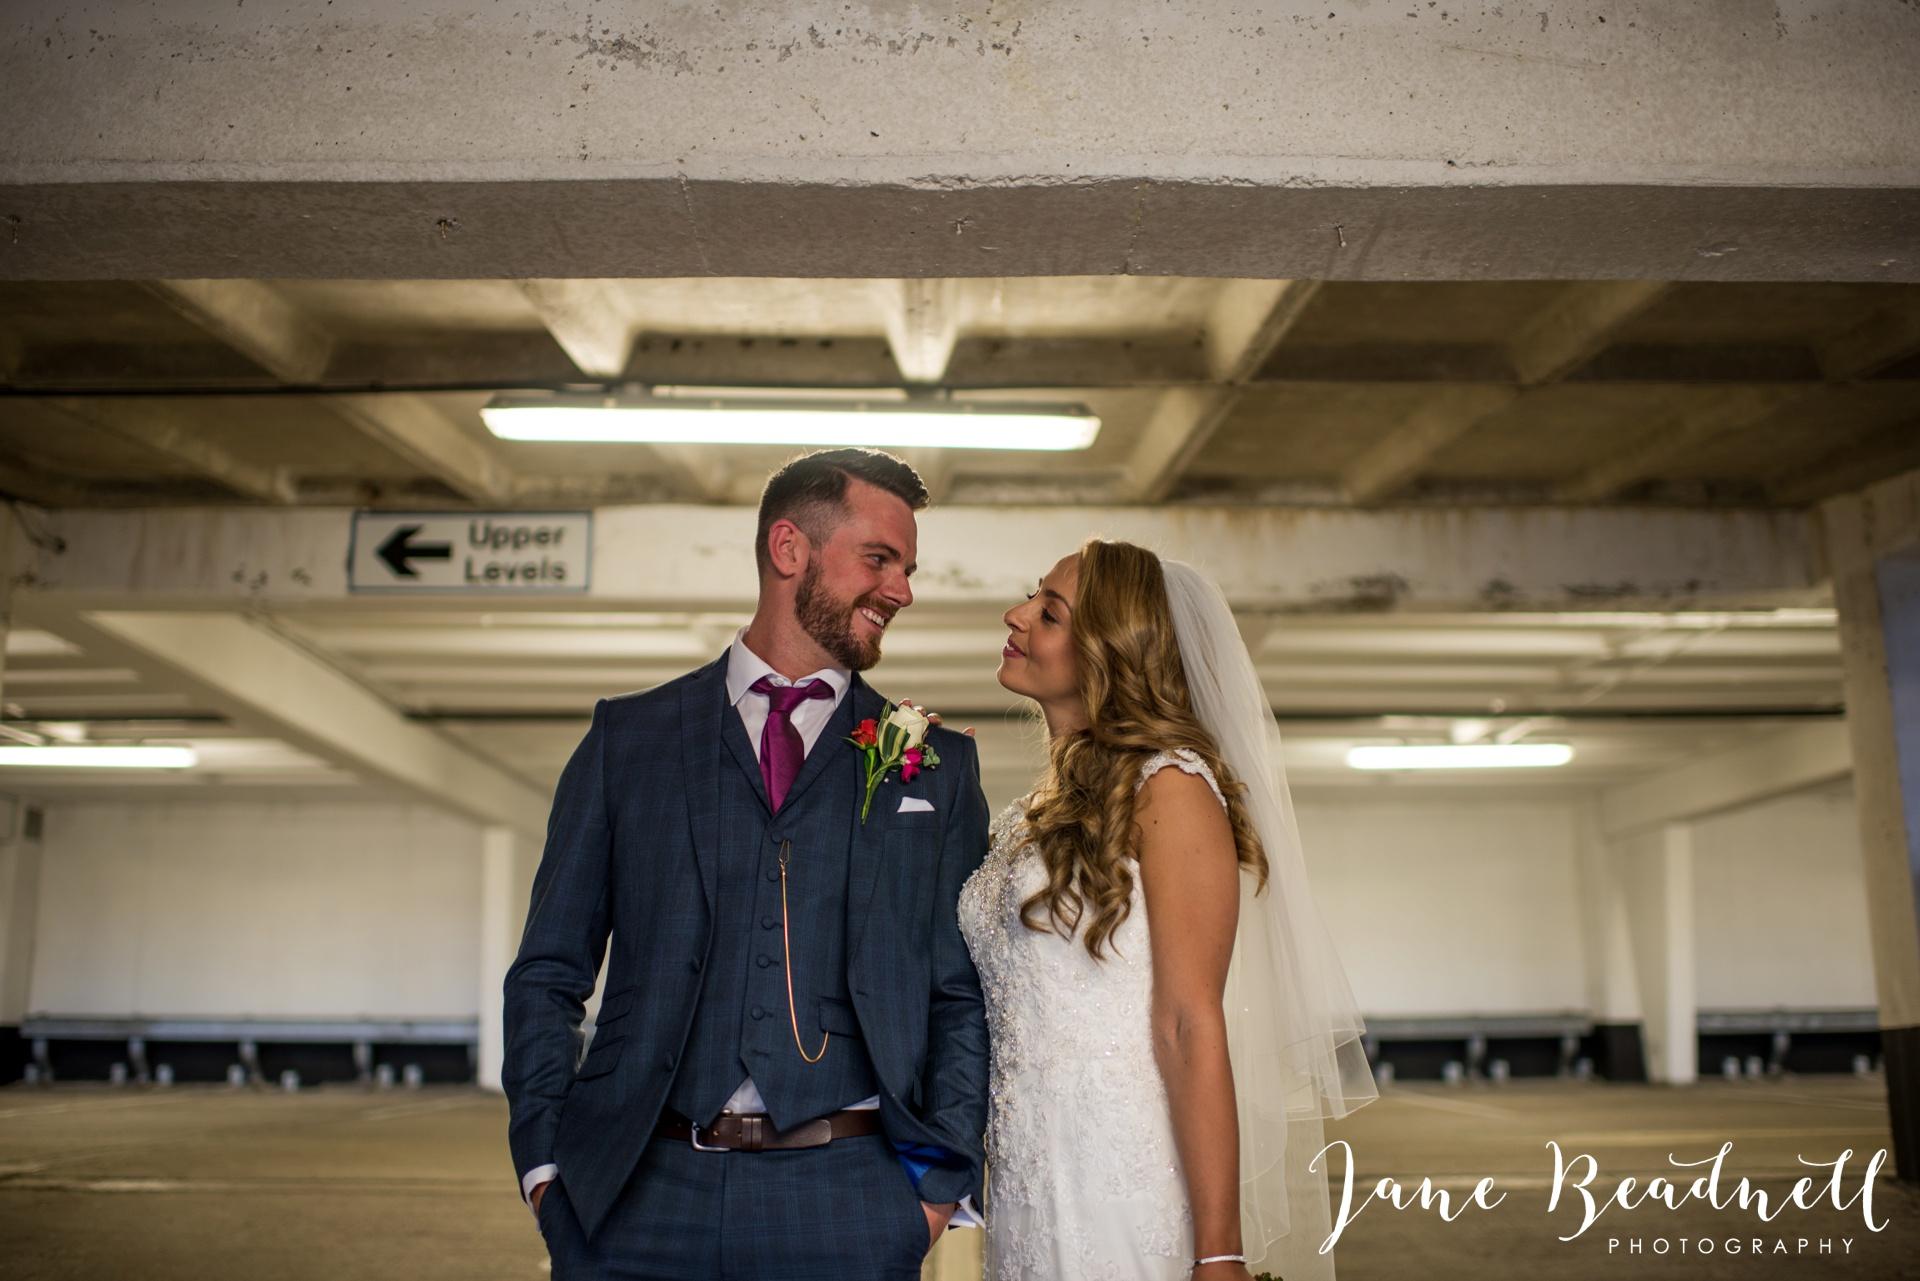 Jane Beadnell fine art wedding photographer Harrogate_0005